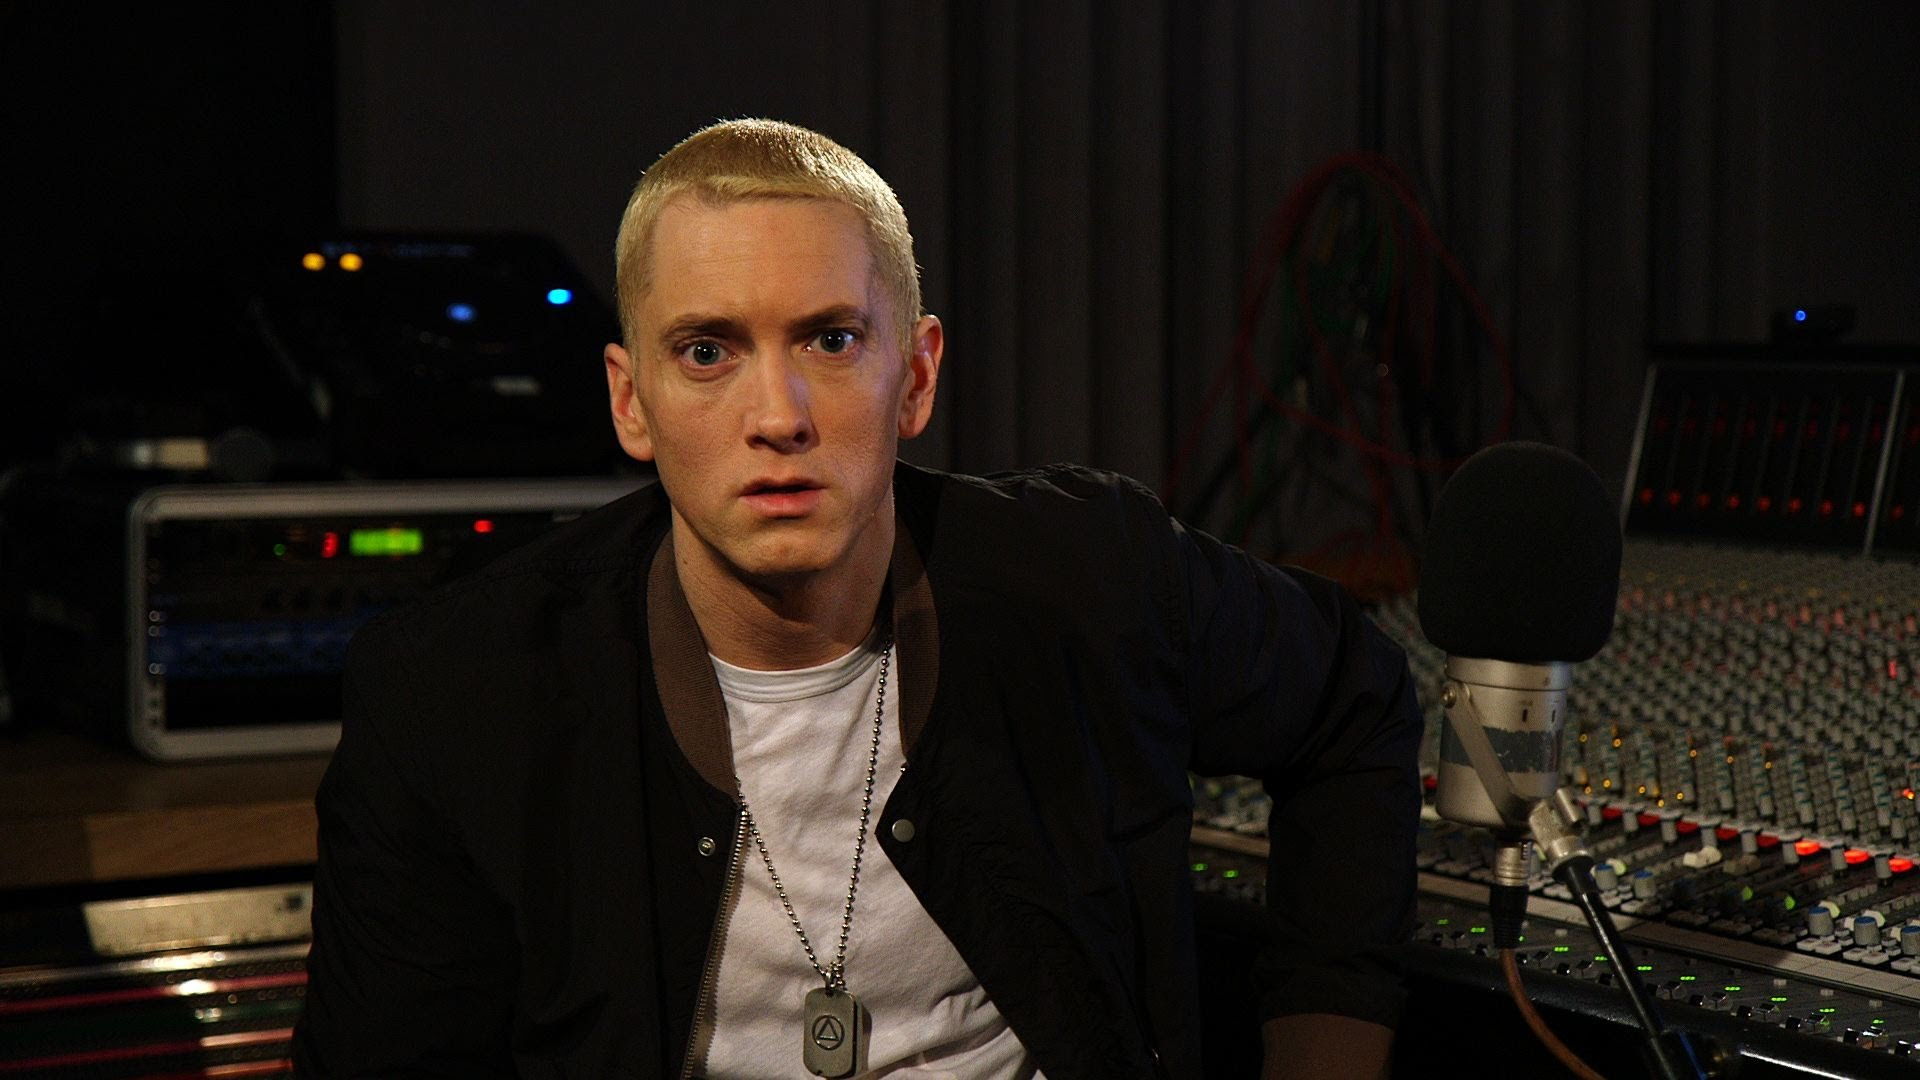 Zane Lowe Interviews Eminem [Full Interview]